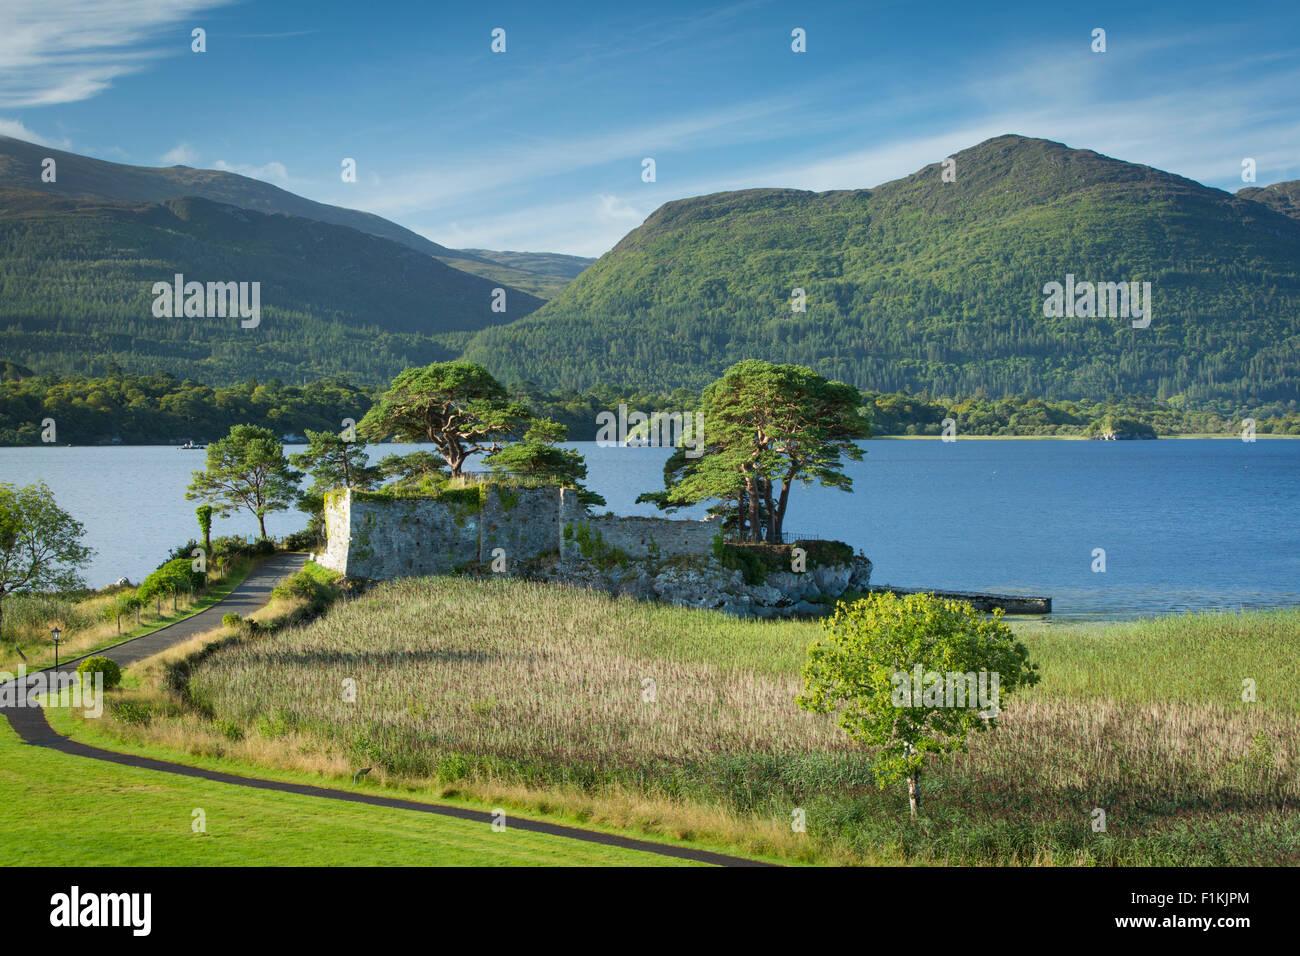 McCarthy Mor Castle (b. 12th Century), along Lough Leane near Killarney, County Kerry, Ireland - Stock Image